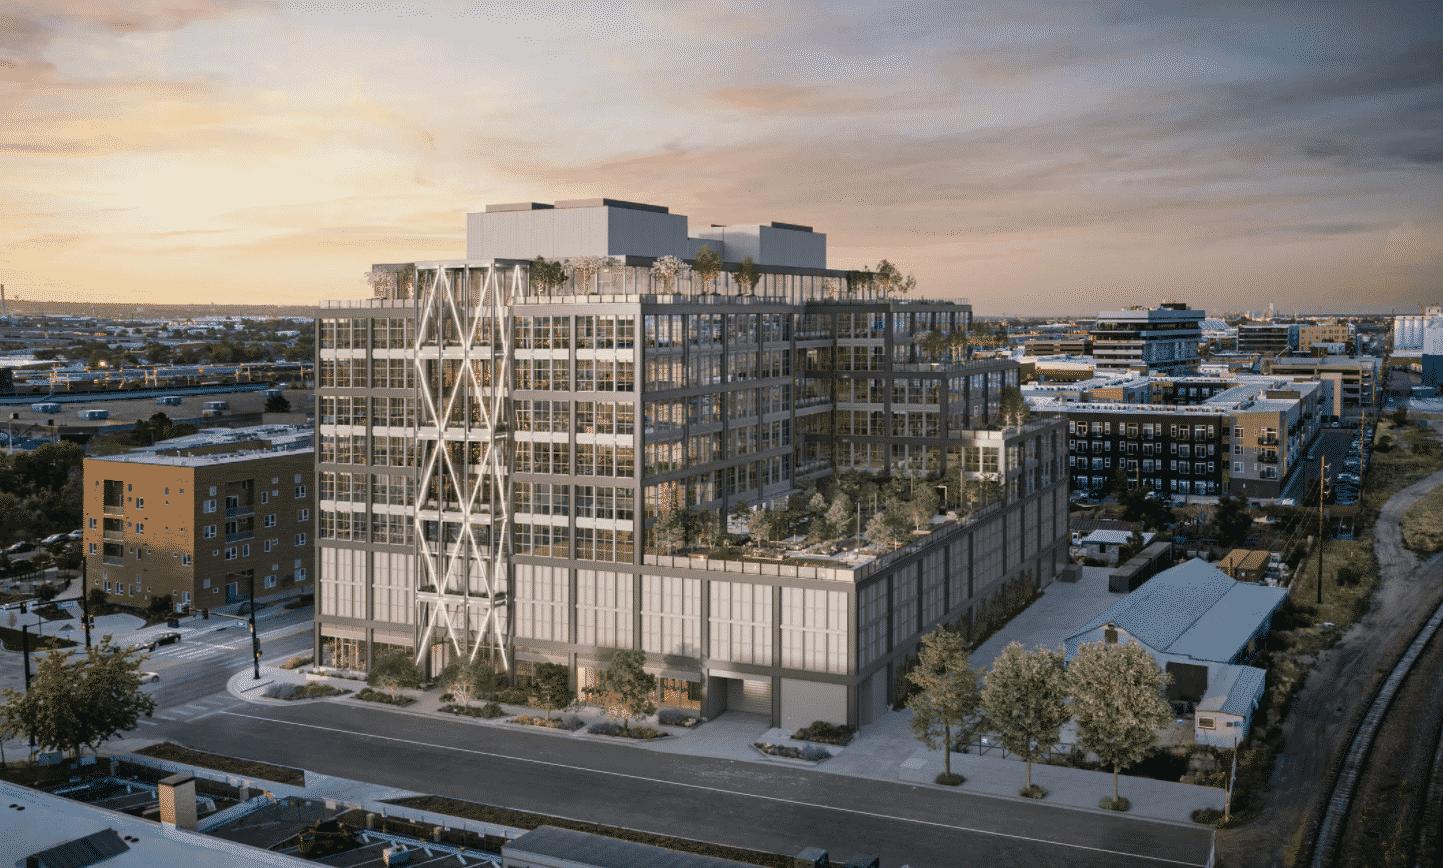 Steel House RiNo Denver, CO office commercial construction rendering